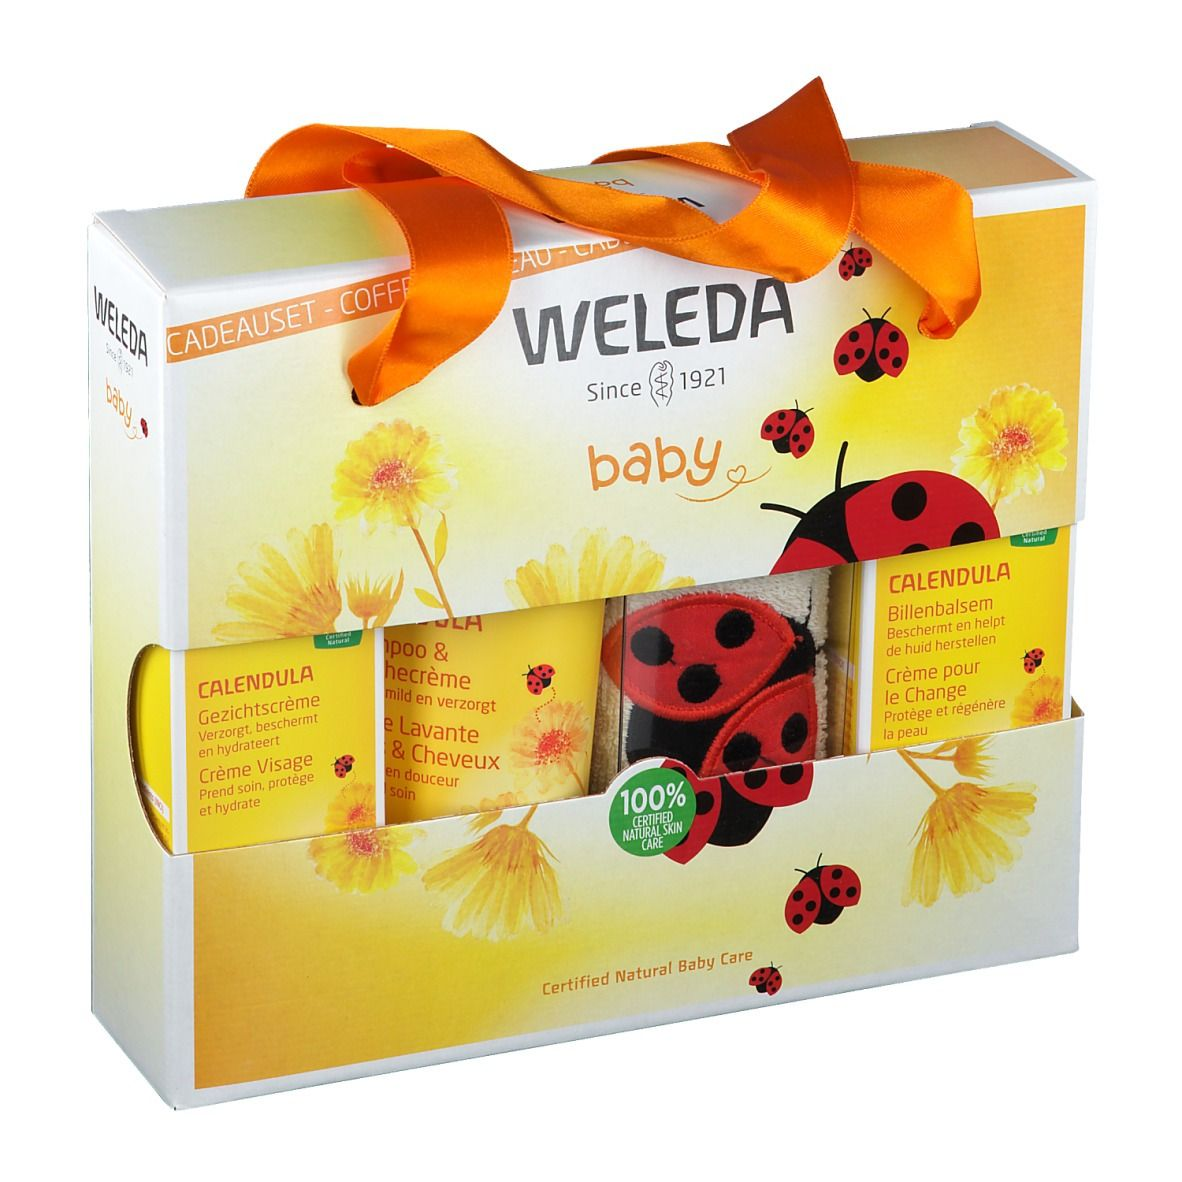 WELEDA Baby Coffret Cadeau au Calendula